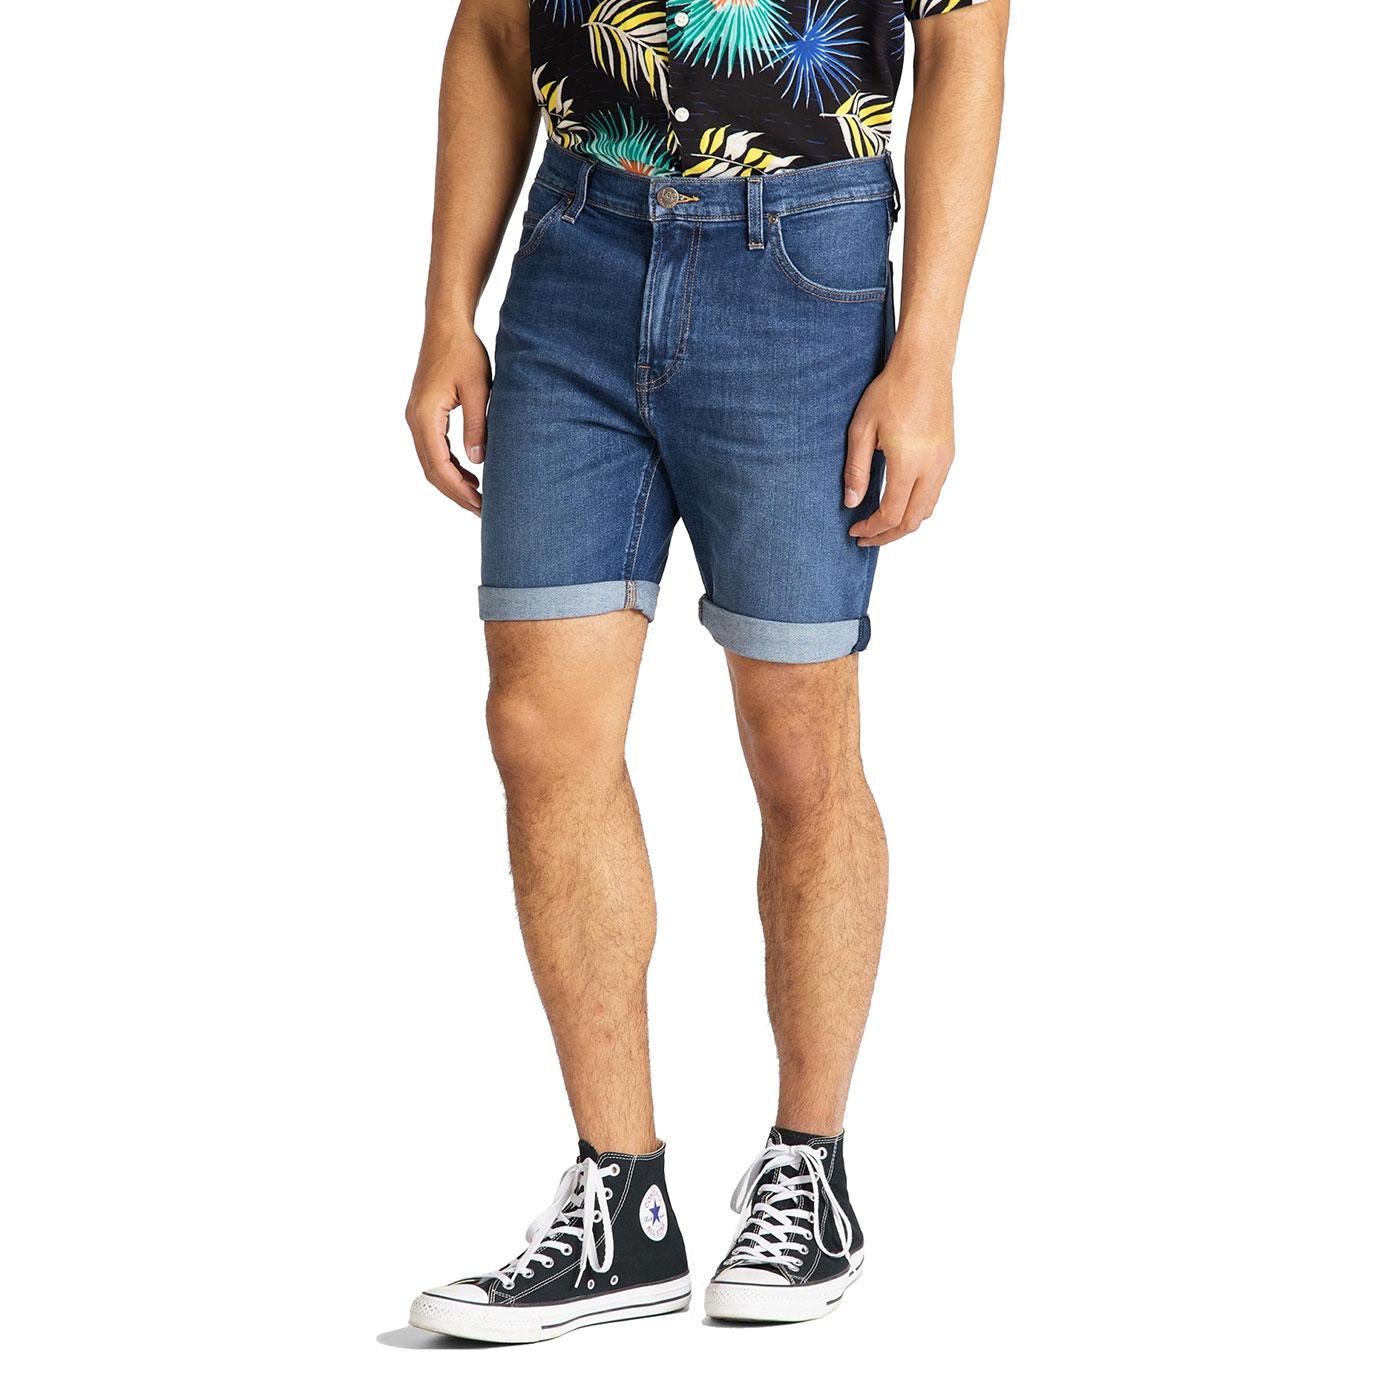 Rider LEE JEANS Men's Retro Denim Shorts - Hawaii